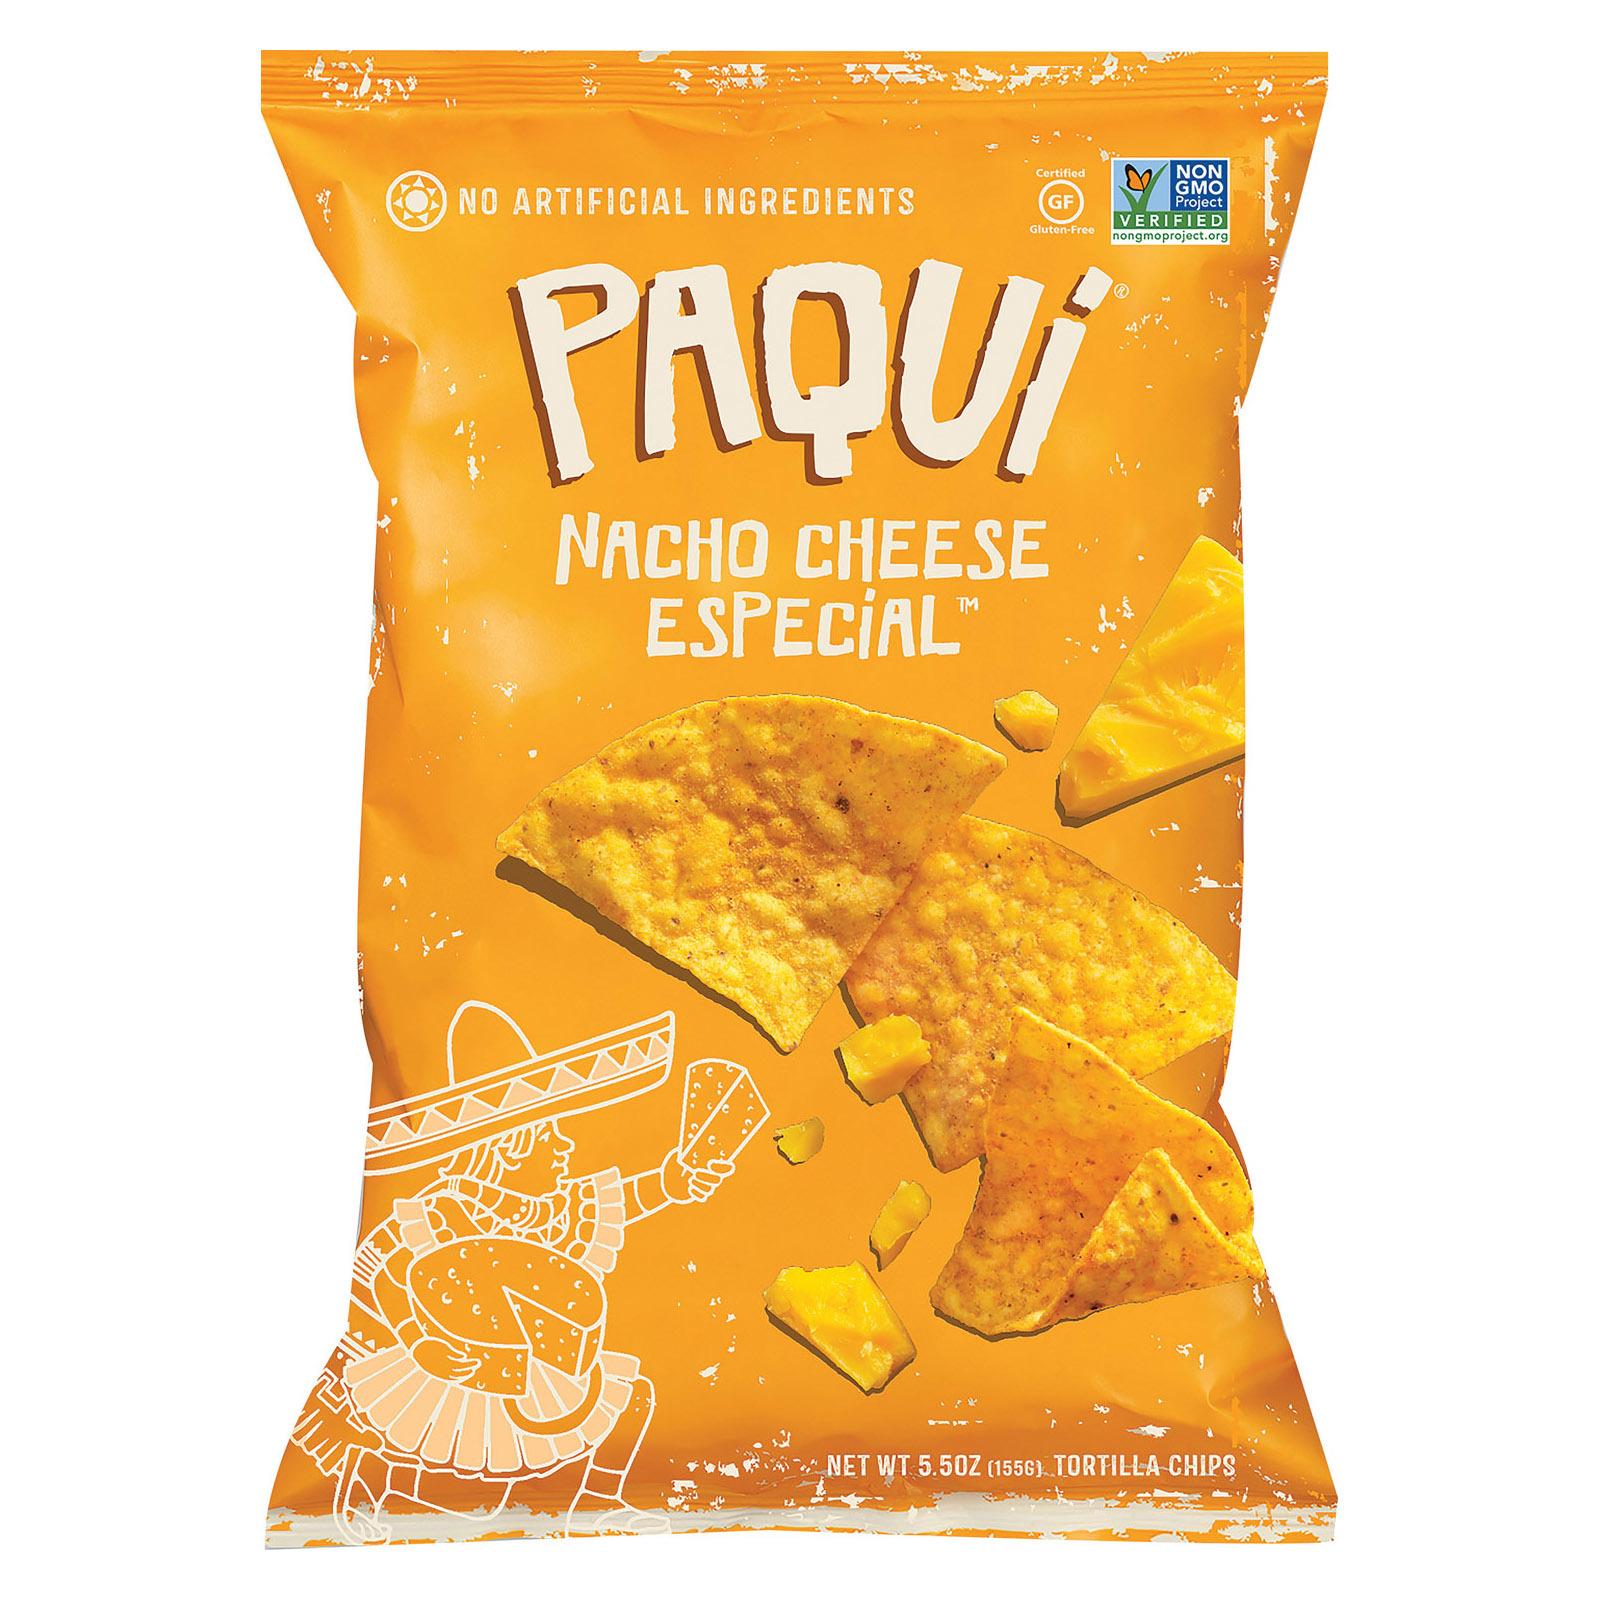 Paqui Tortilla Chip - Nacho Cheese Special - Case of 12 - 5.5 oz.